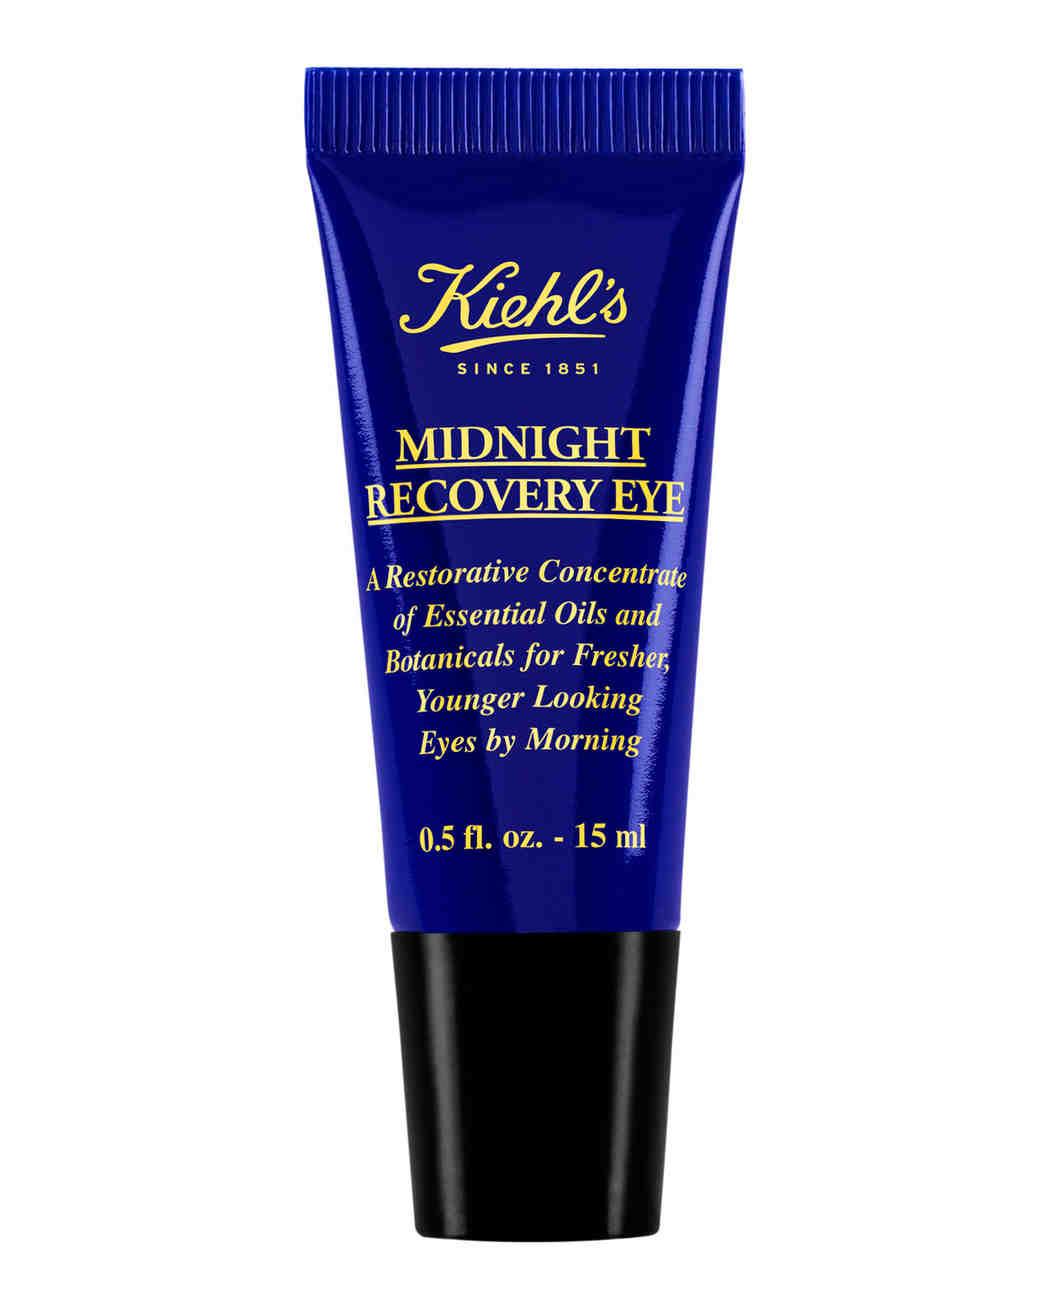 overnight-beauty-producst-kiehls-midnight-recovery-eye-0915.jpg